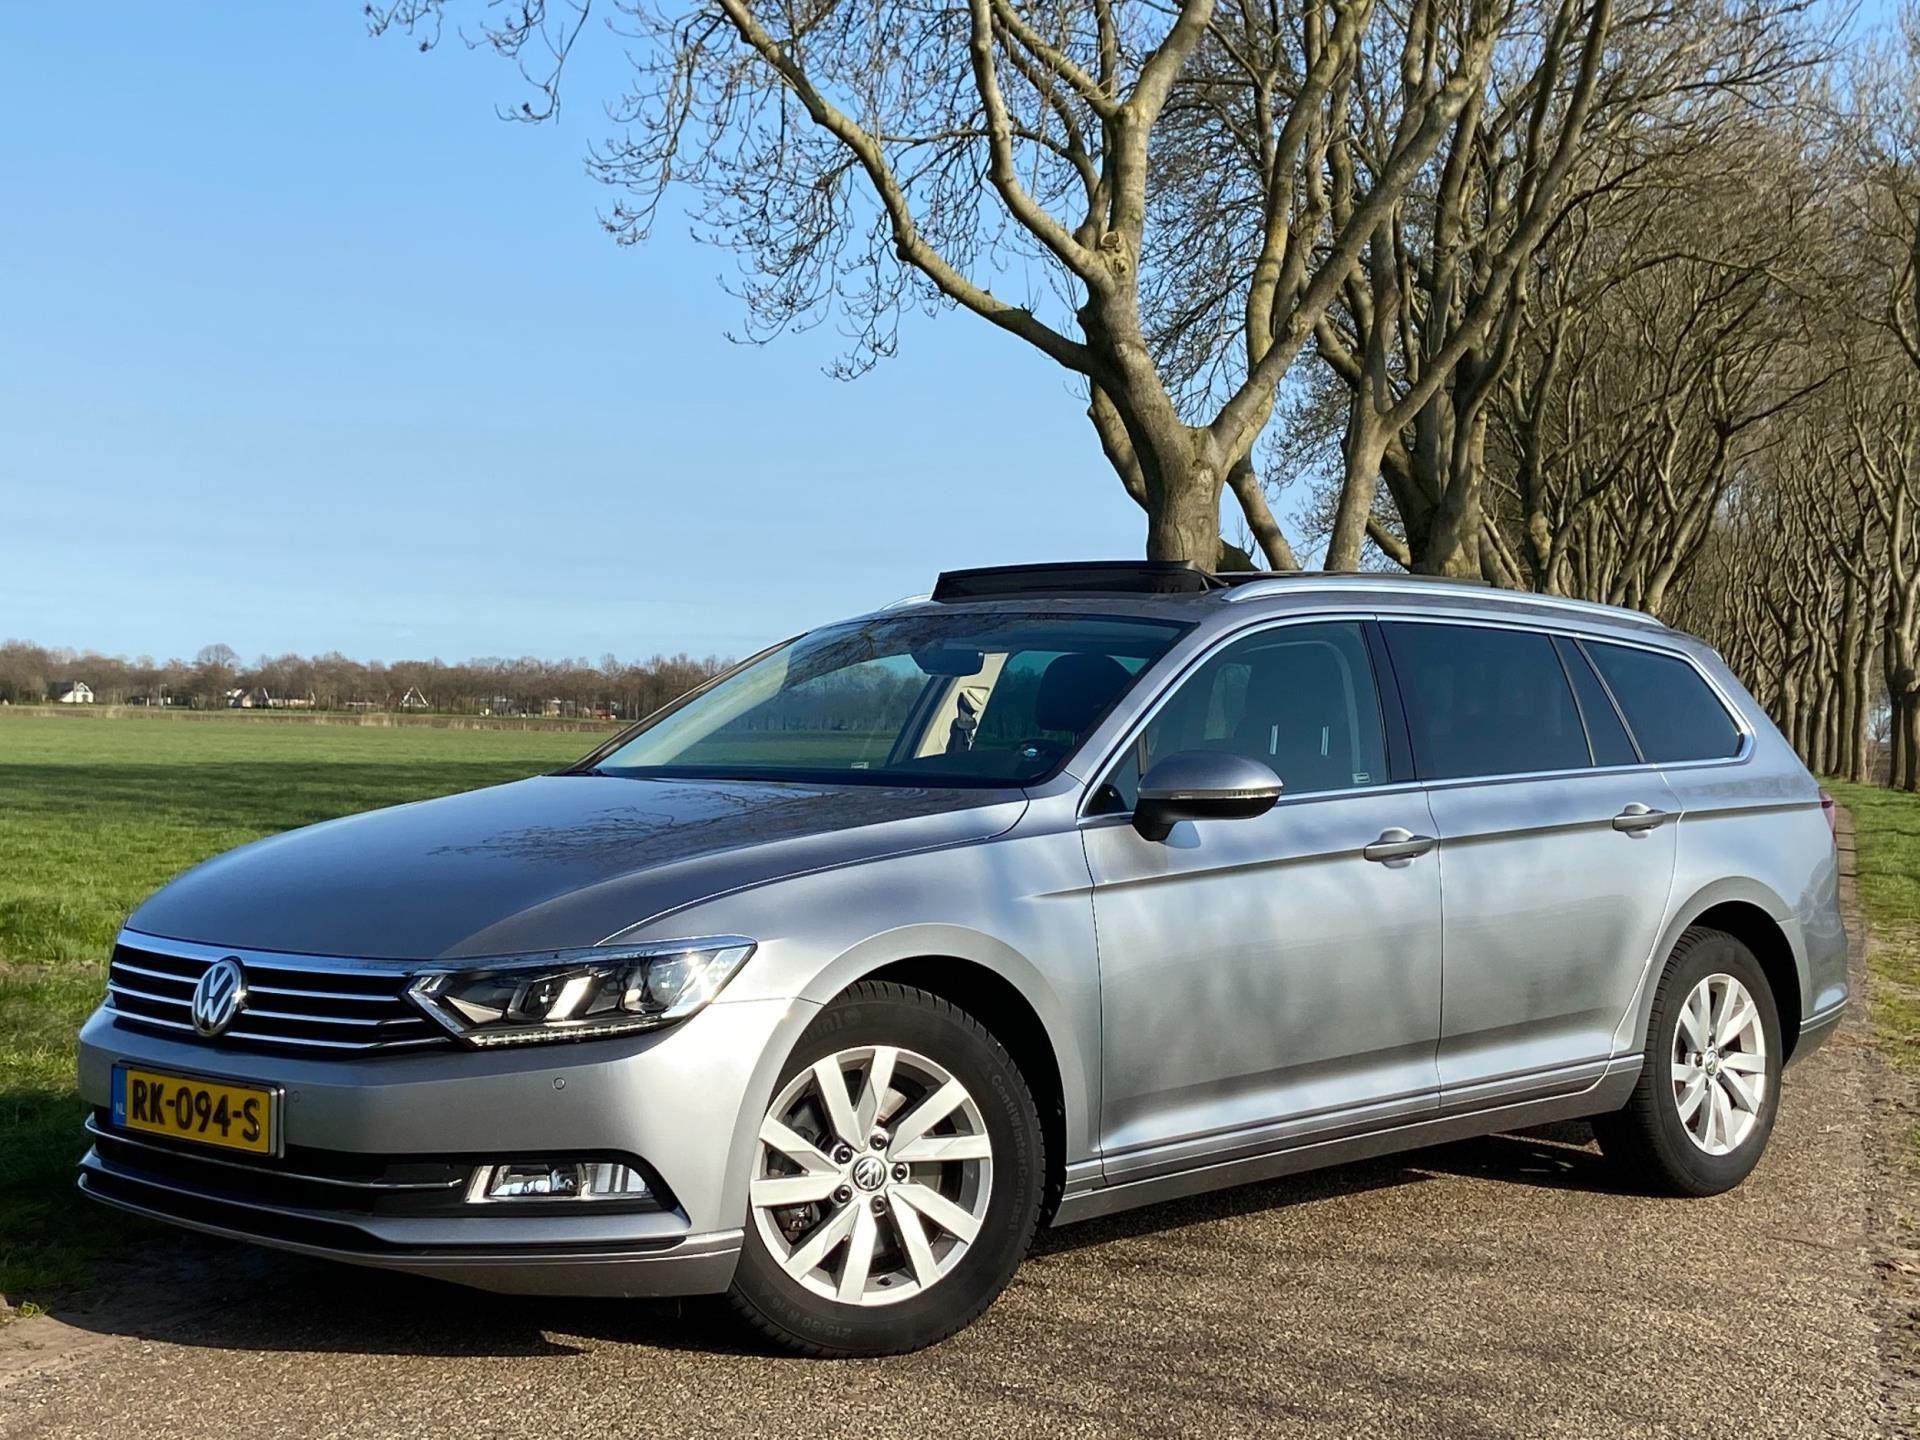 Volkswagen Passat Variant occasion - Autobedrijf Tromp v.o.f.